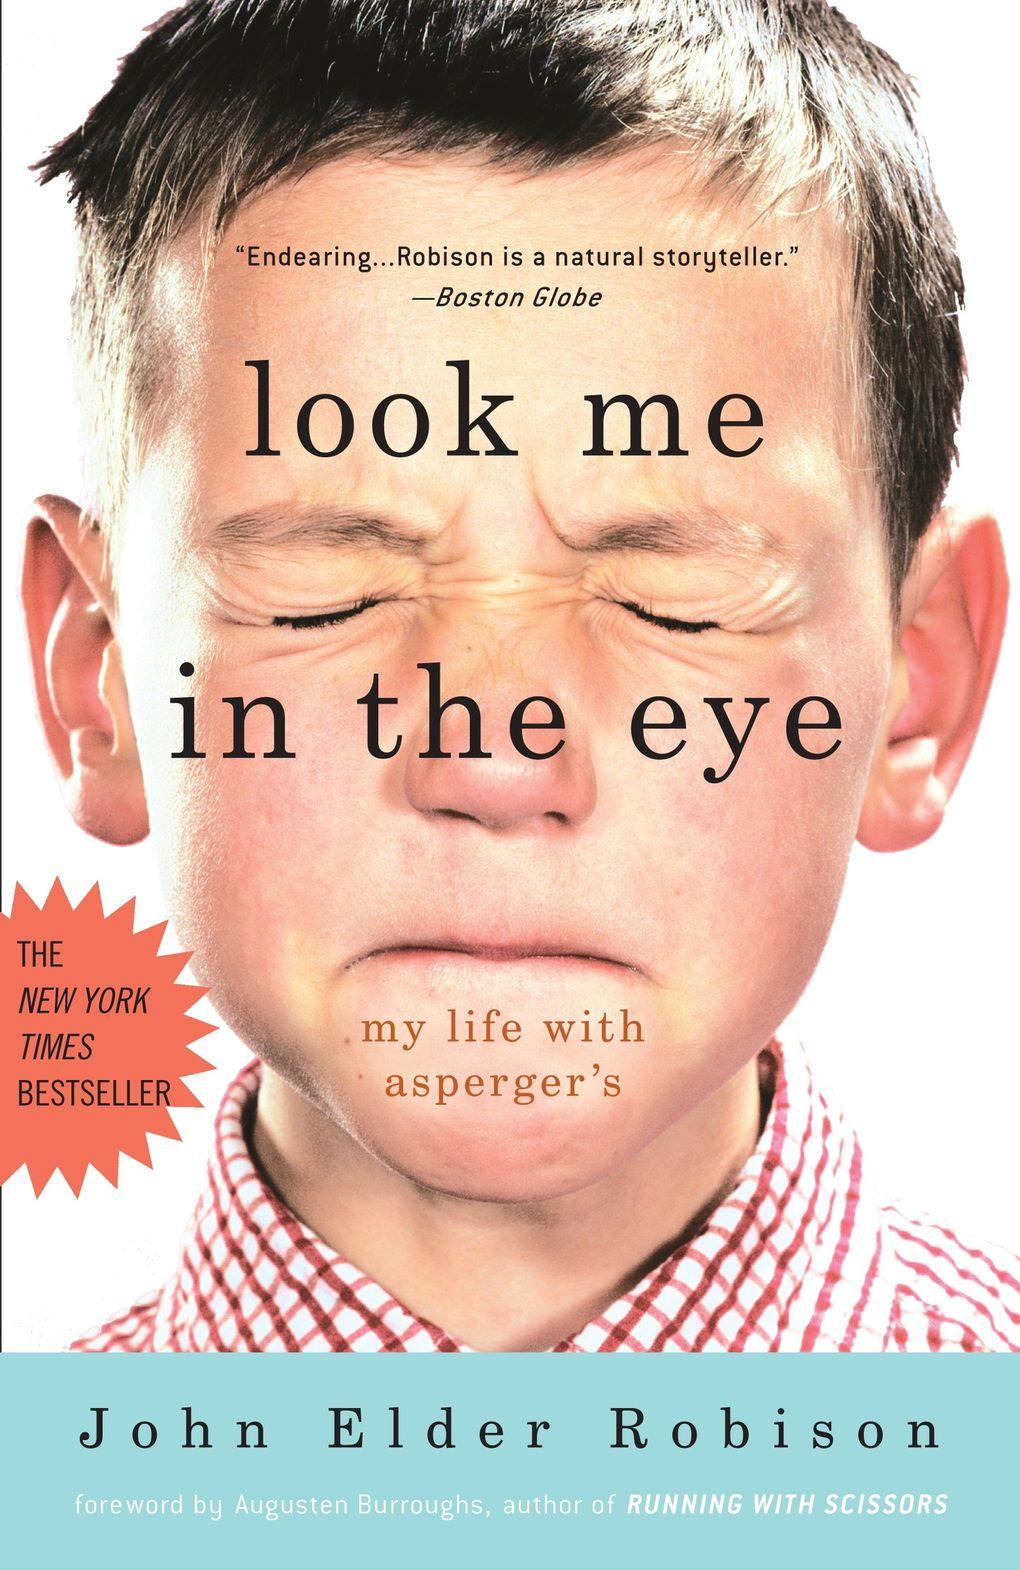 """Look Me in the Eye: My Life with Asperger's"" by John Elder Robison. (Penguin Random House)"